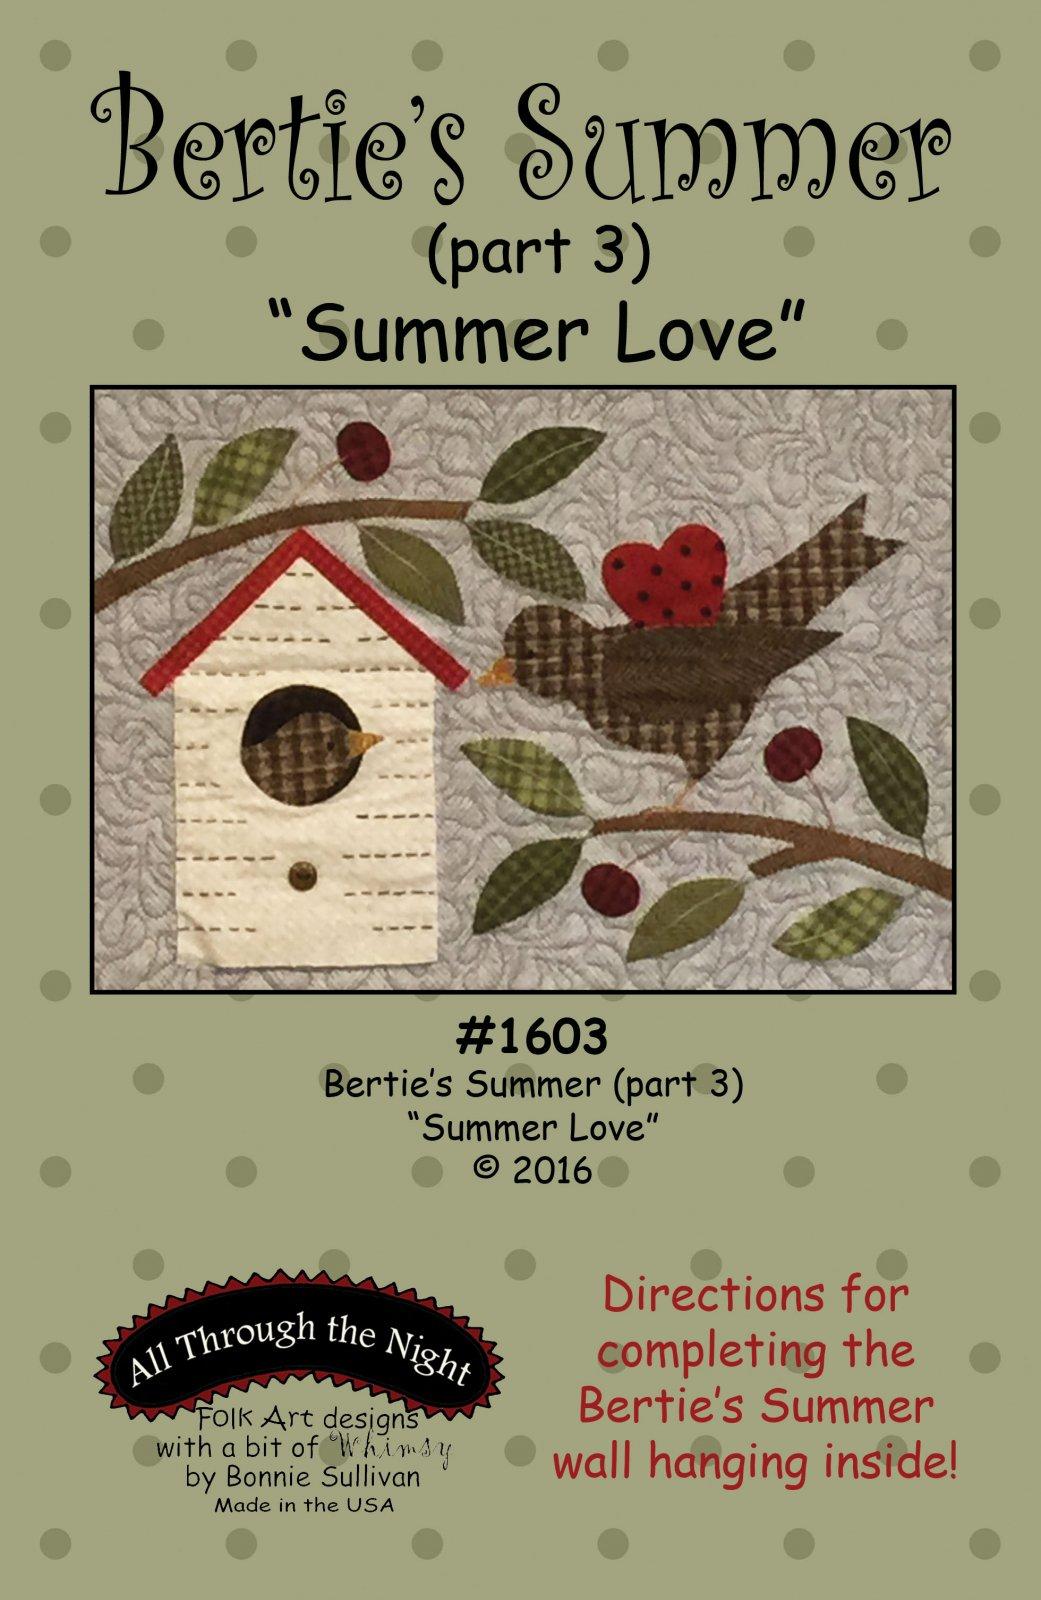 1603 Bertie's Summer Summer Love (3)